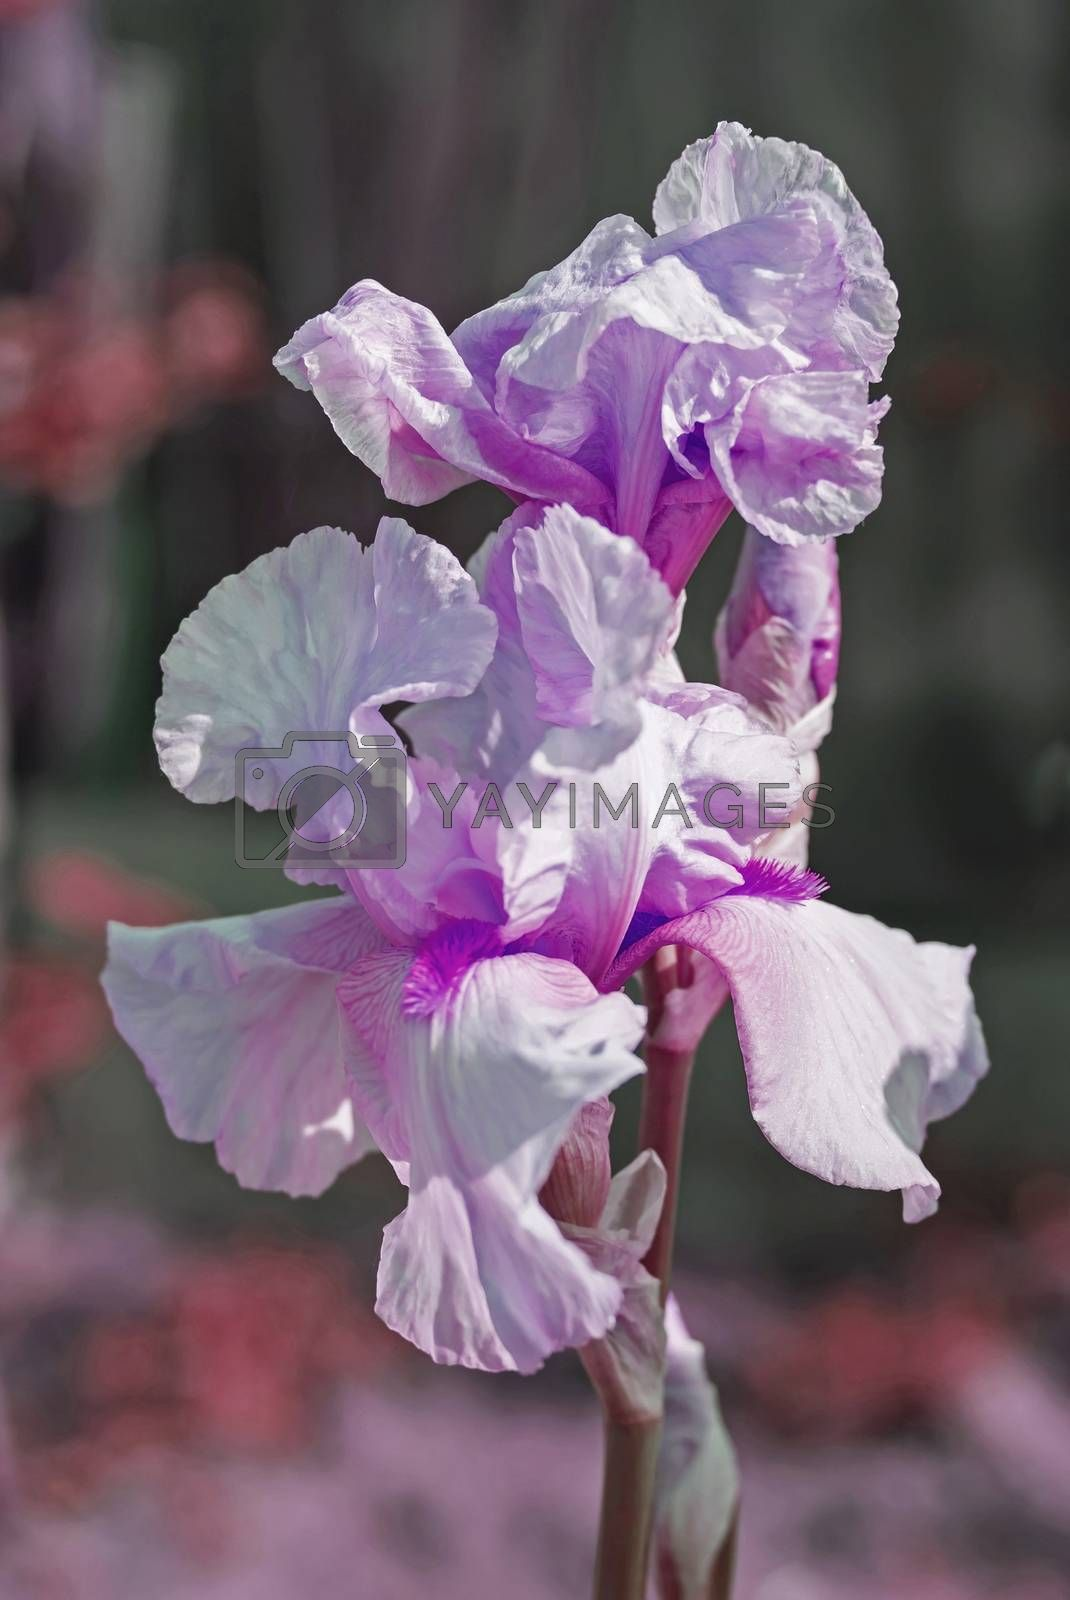 Iris flower in the flower bed, perennials, spring or summer flower, soft focus